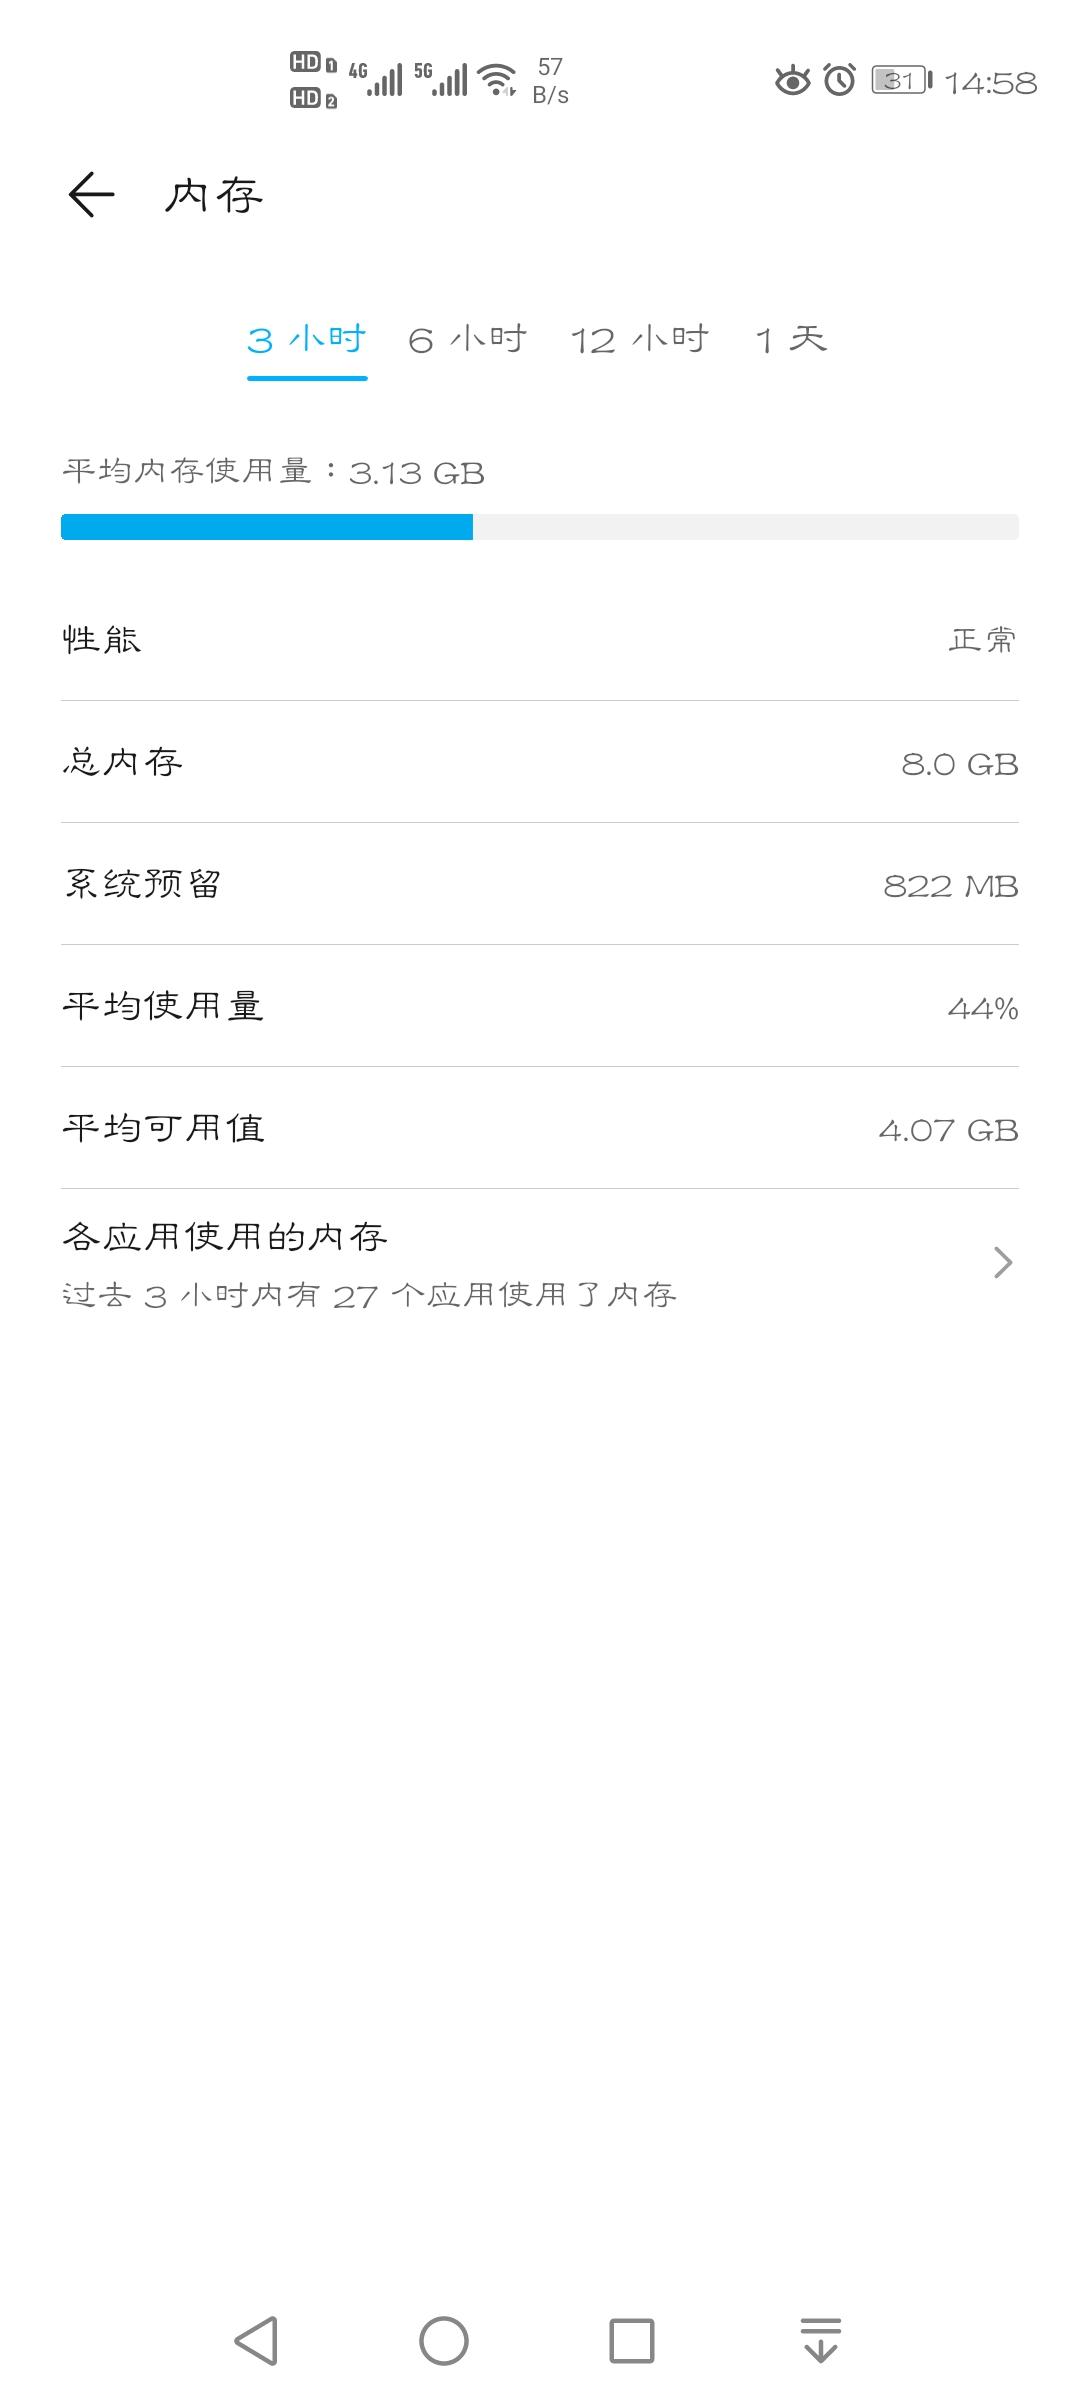 Screenshot_20191215_145849_com.android.settings.jpg